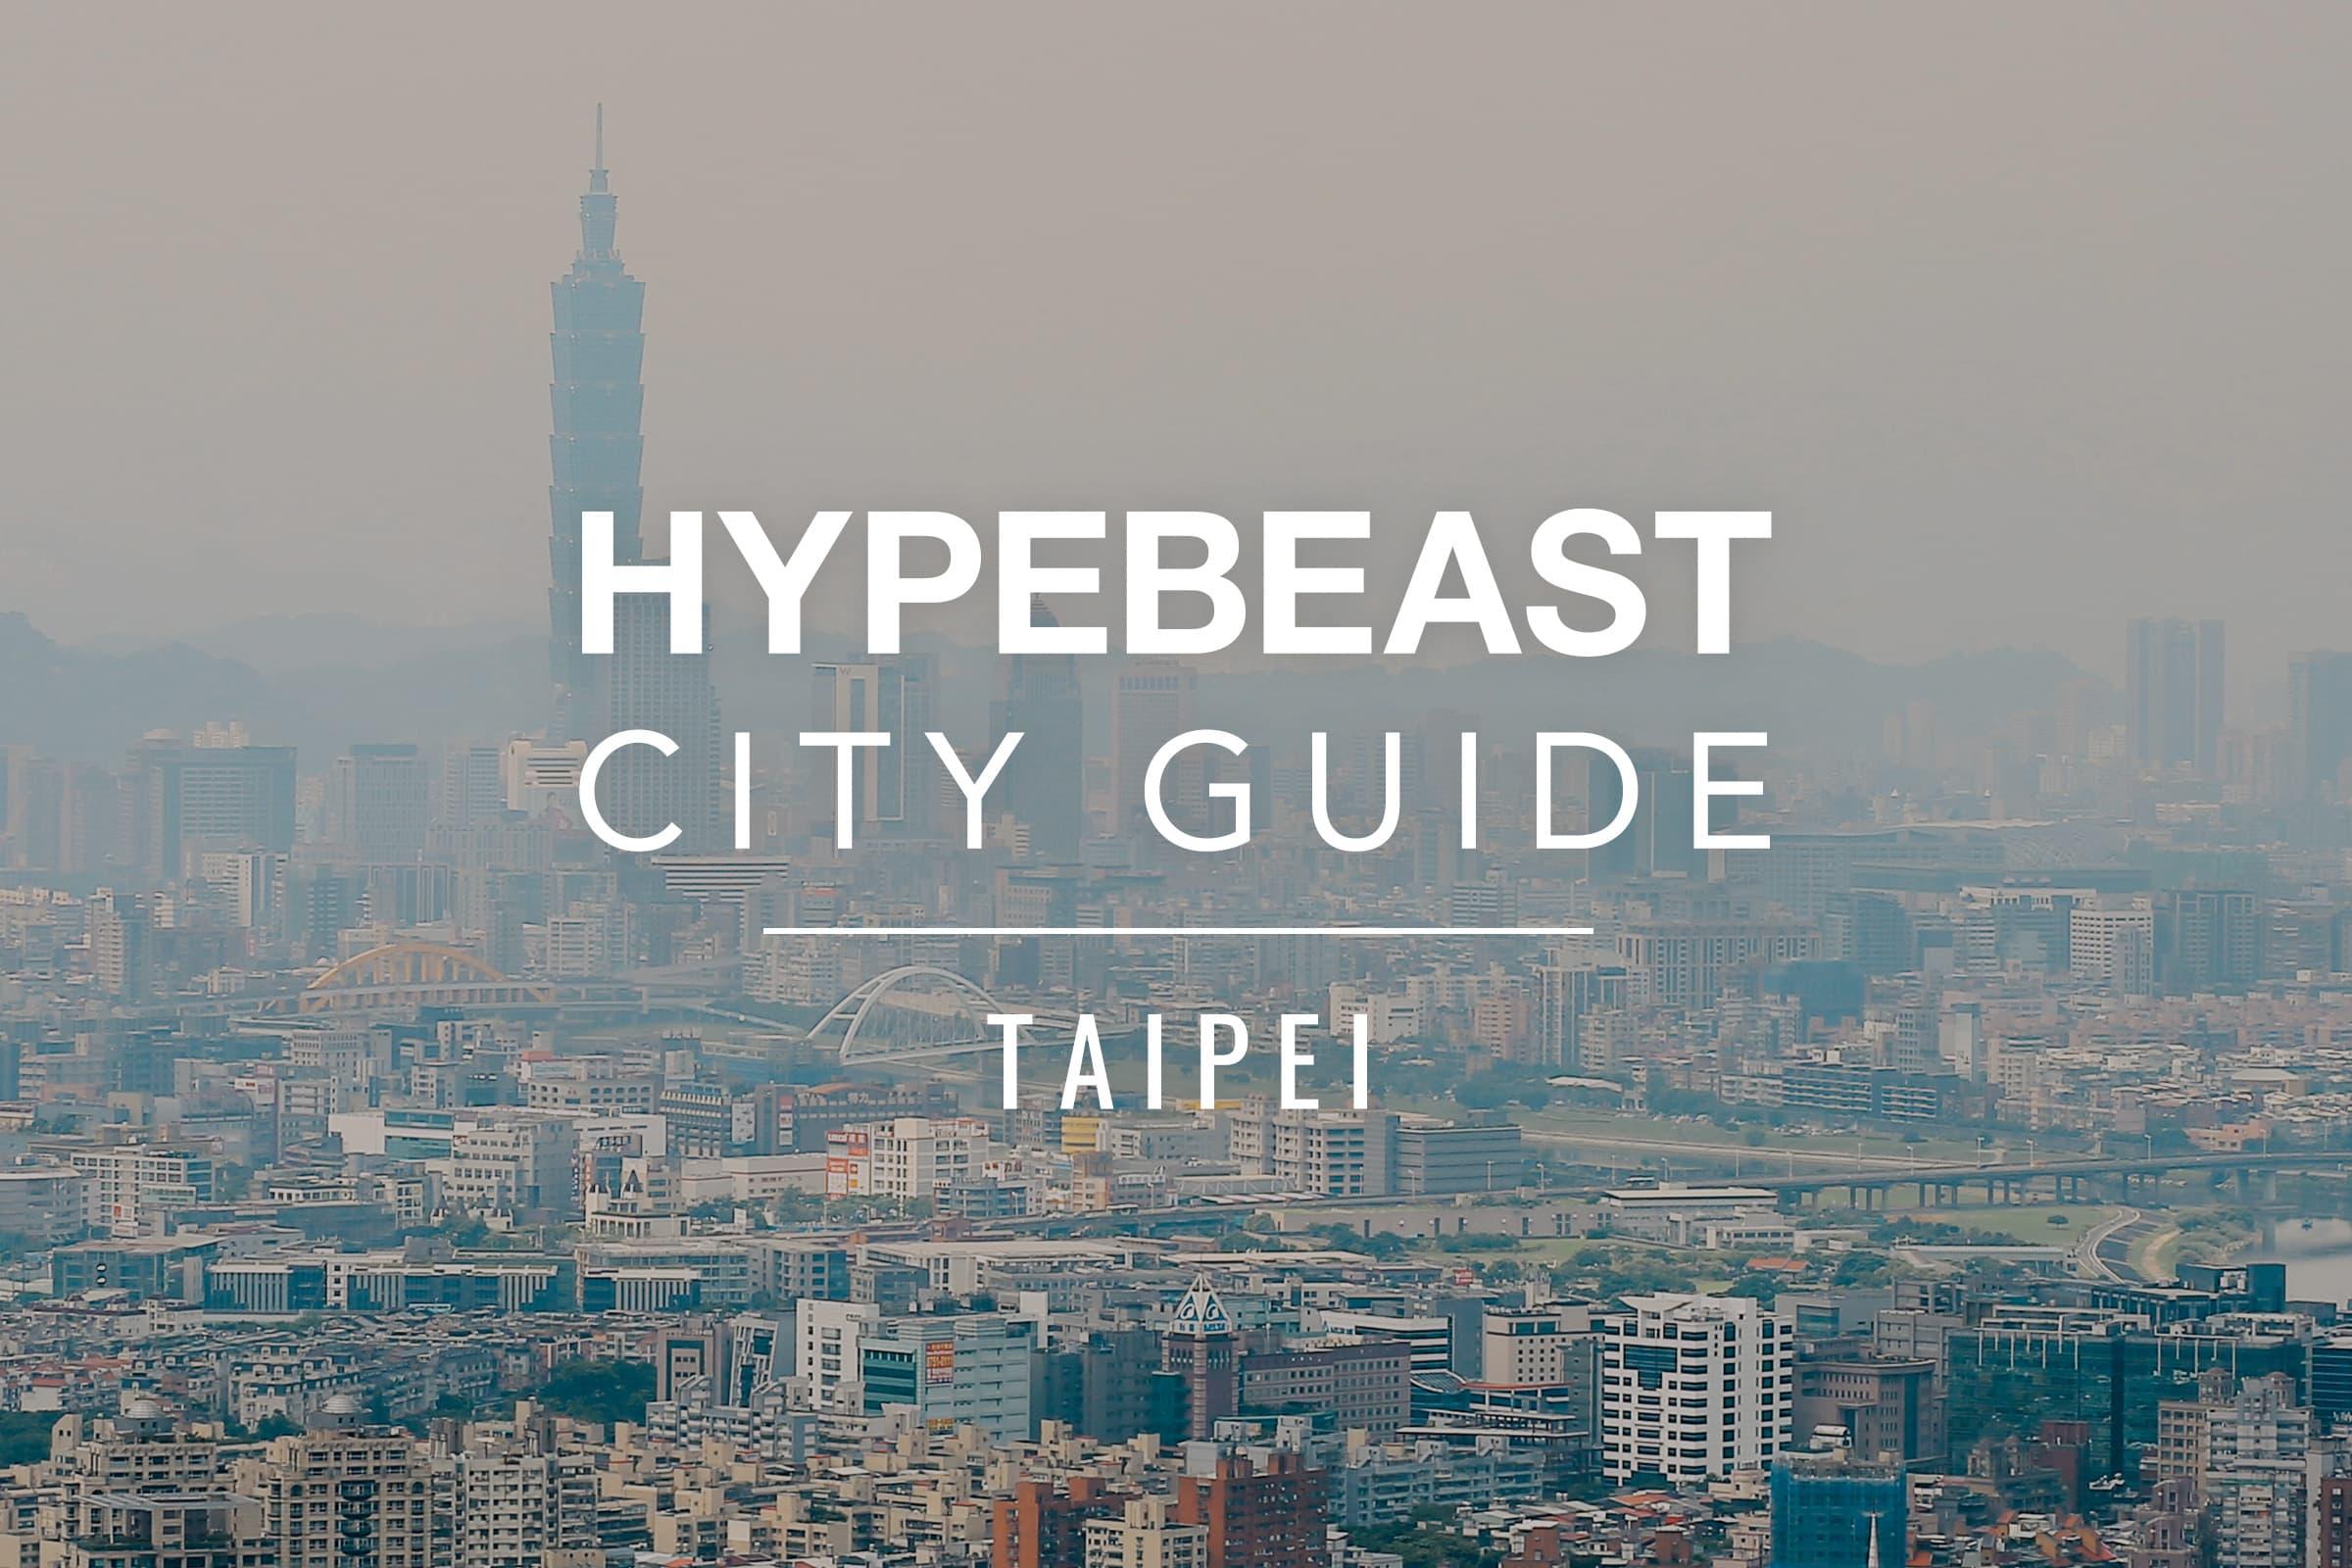 HYPEBEAST City Guide: 台北城市指南